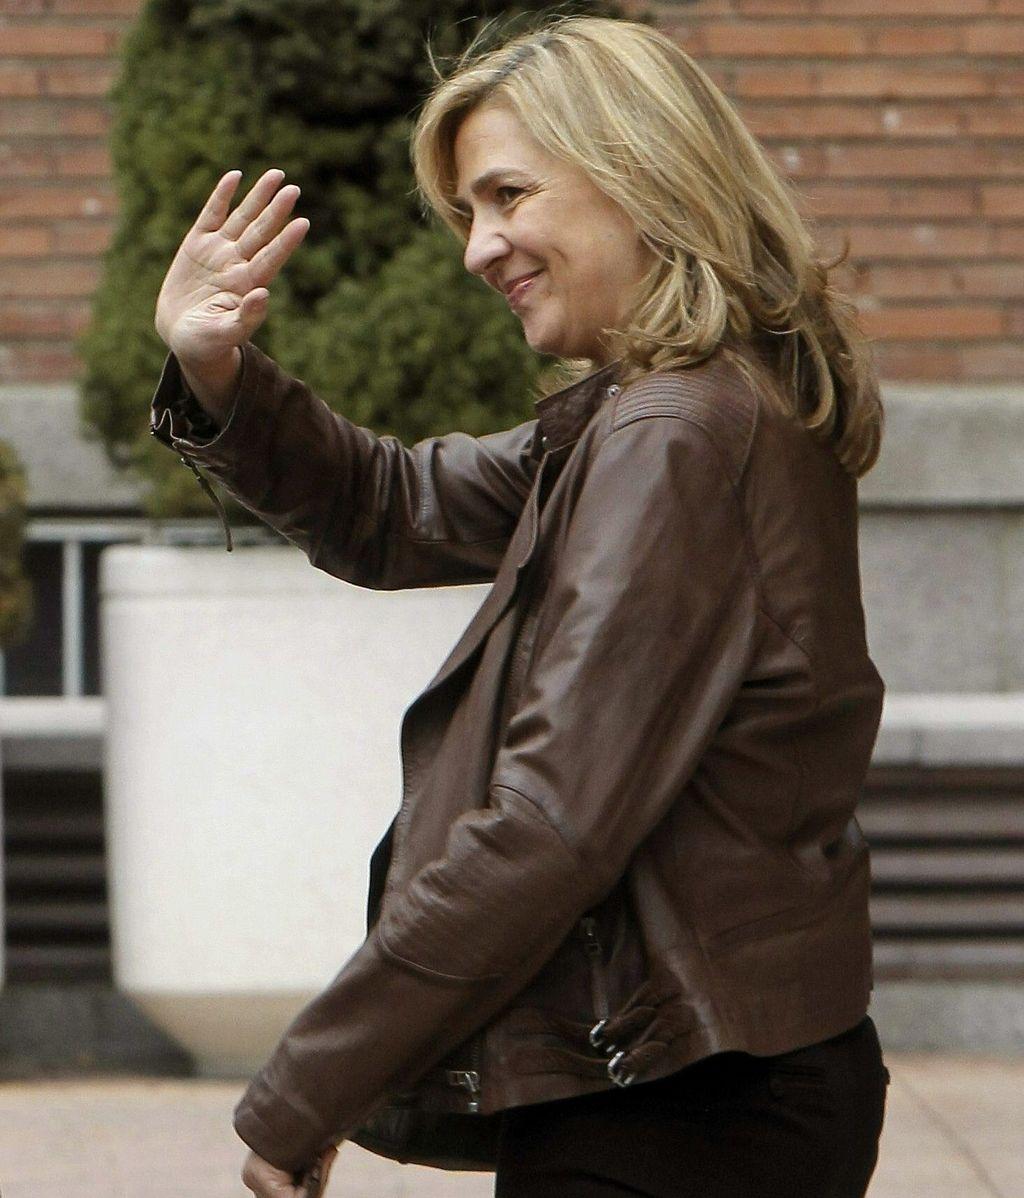 La Infanta Cristina saliendo de la clínica La Milagrosa